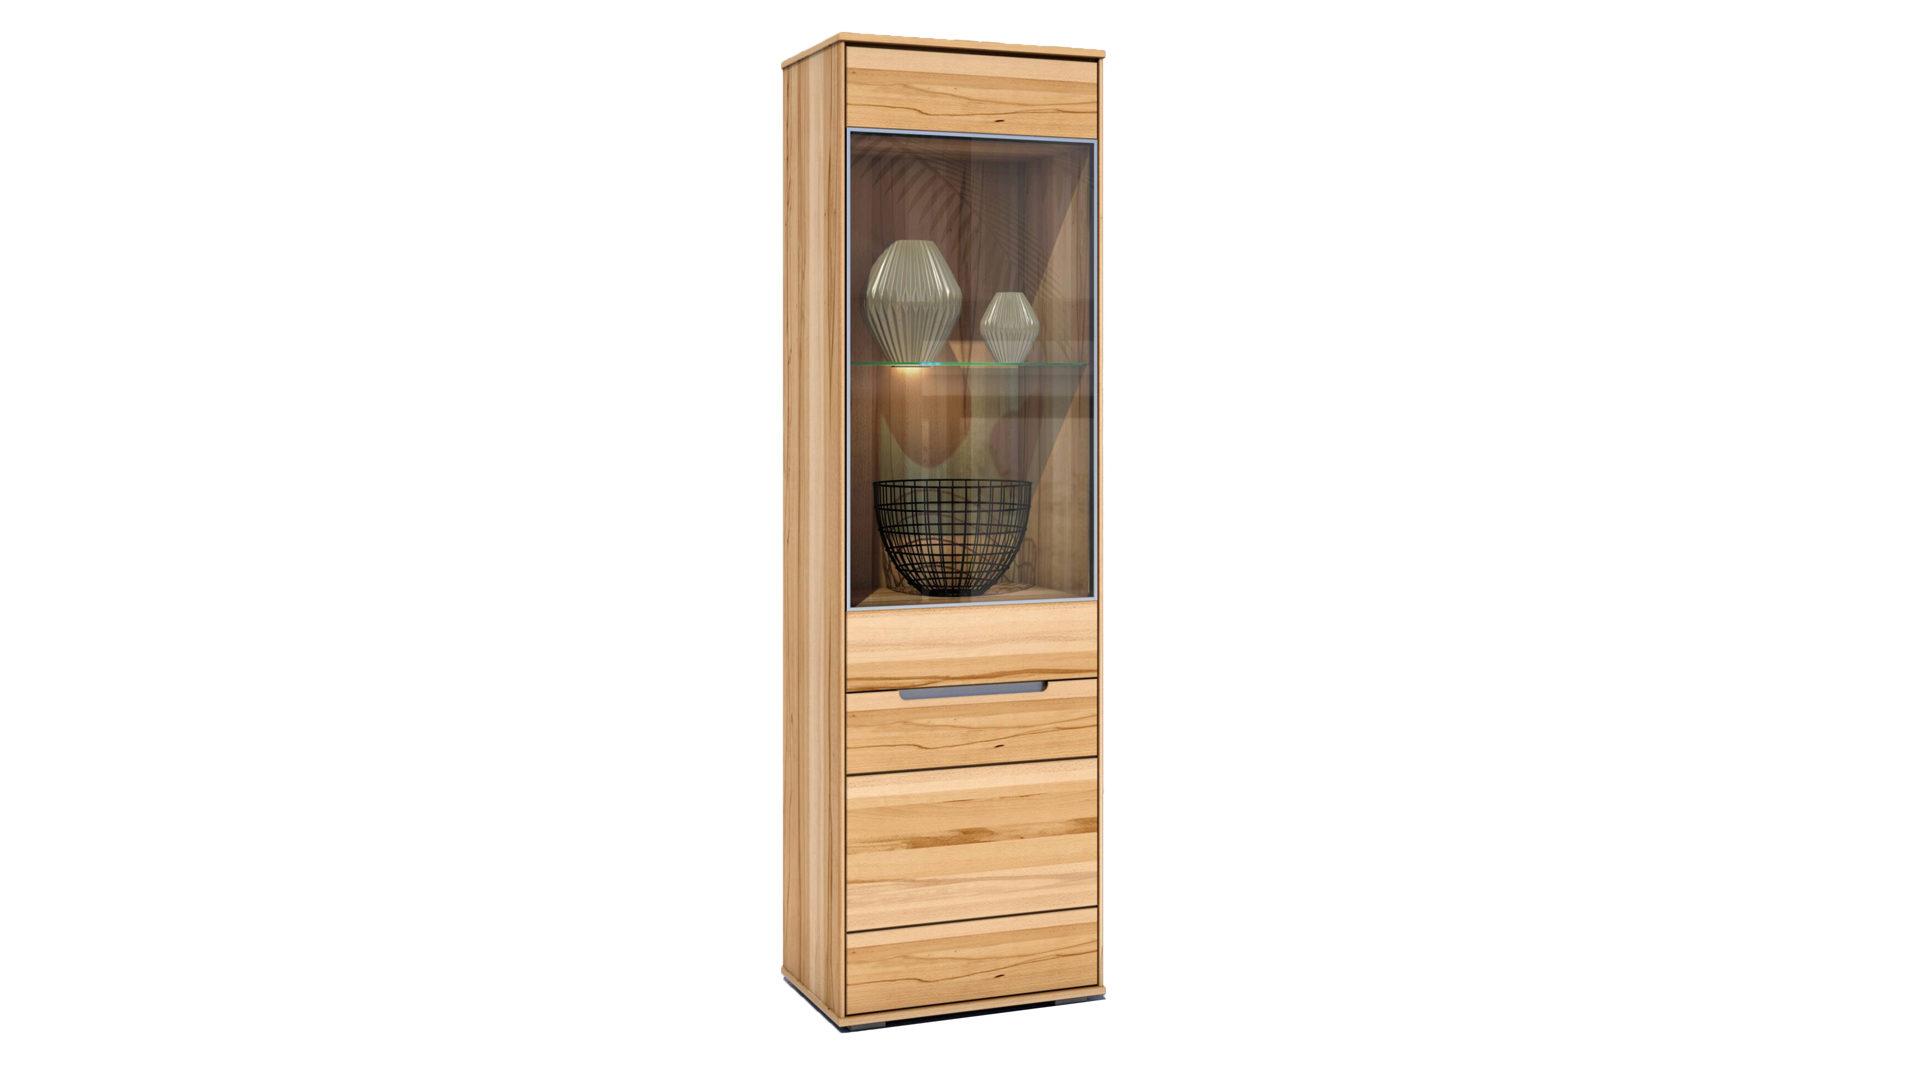 Massivholzmöbel bzw. Vitrine, Kernbuche – zwei Türen, Höhe ca. 203 ...